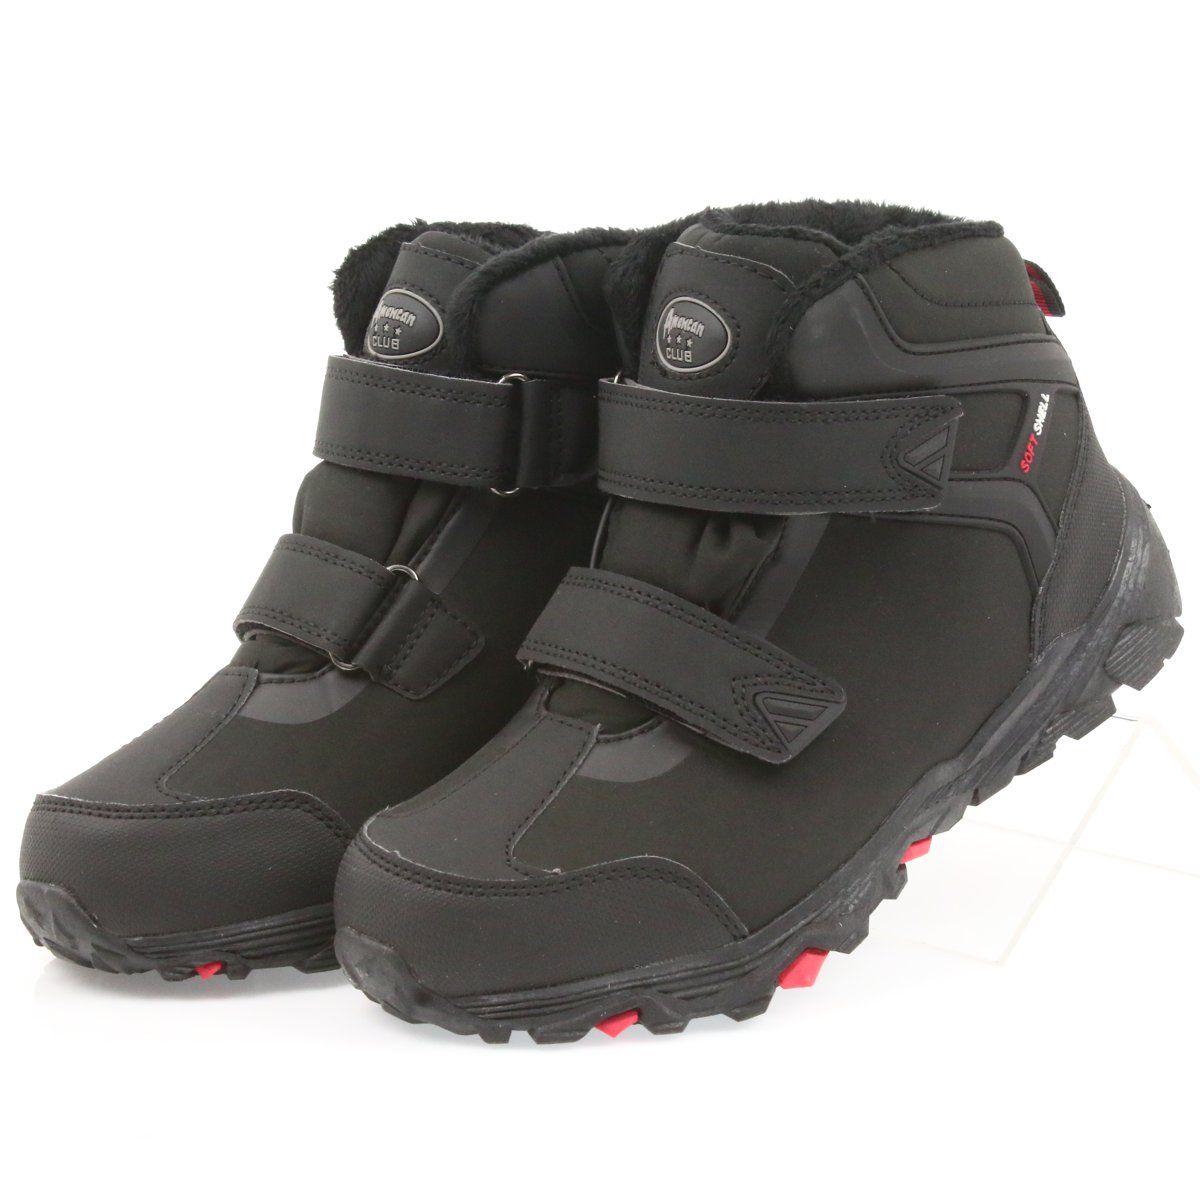 American Club American Trzewiki Buty Zimowe Z Membrana Czarne Boots Hiking Boots Winter Boot